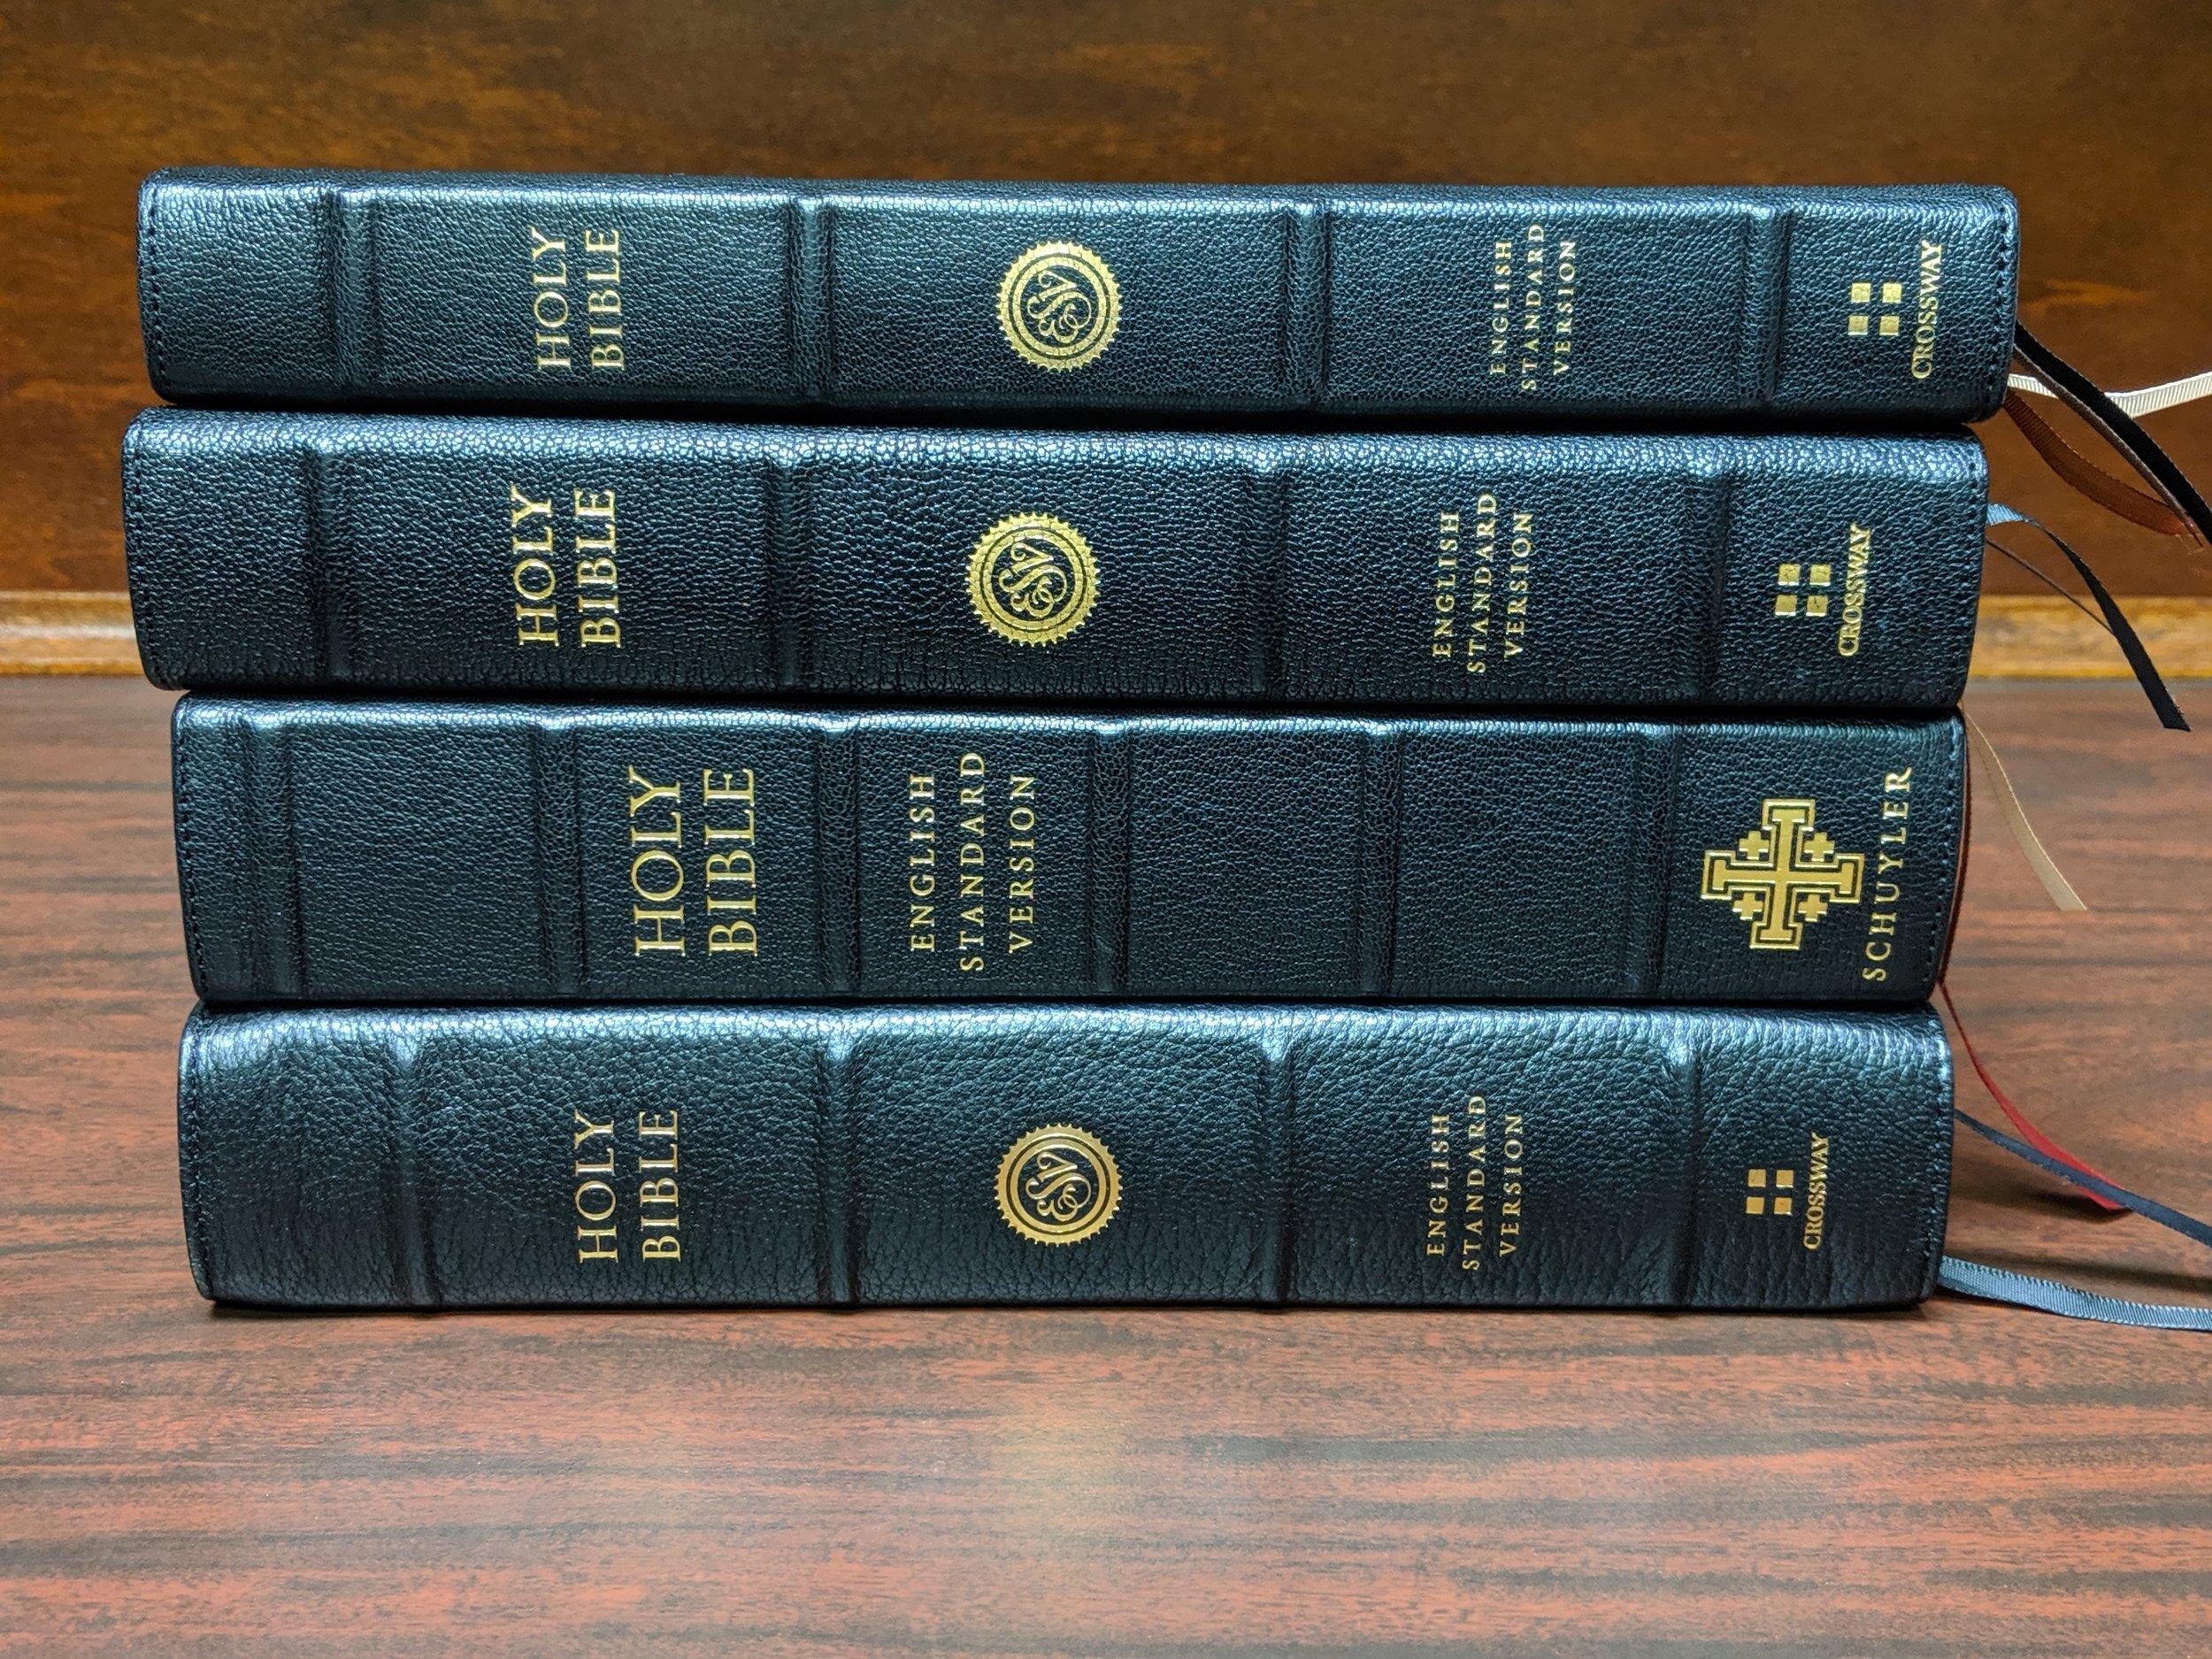 Bottom to Top: ESV Preaching Bible, Schuyler Credo Quentel, Heirloom Legacy, ESV Omega